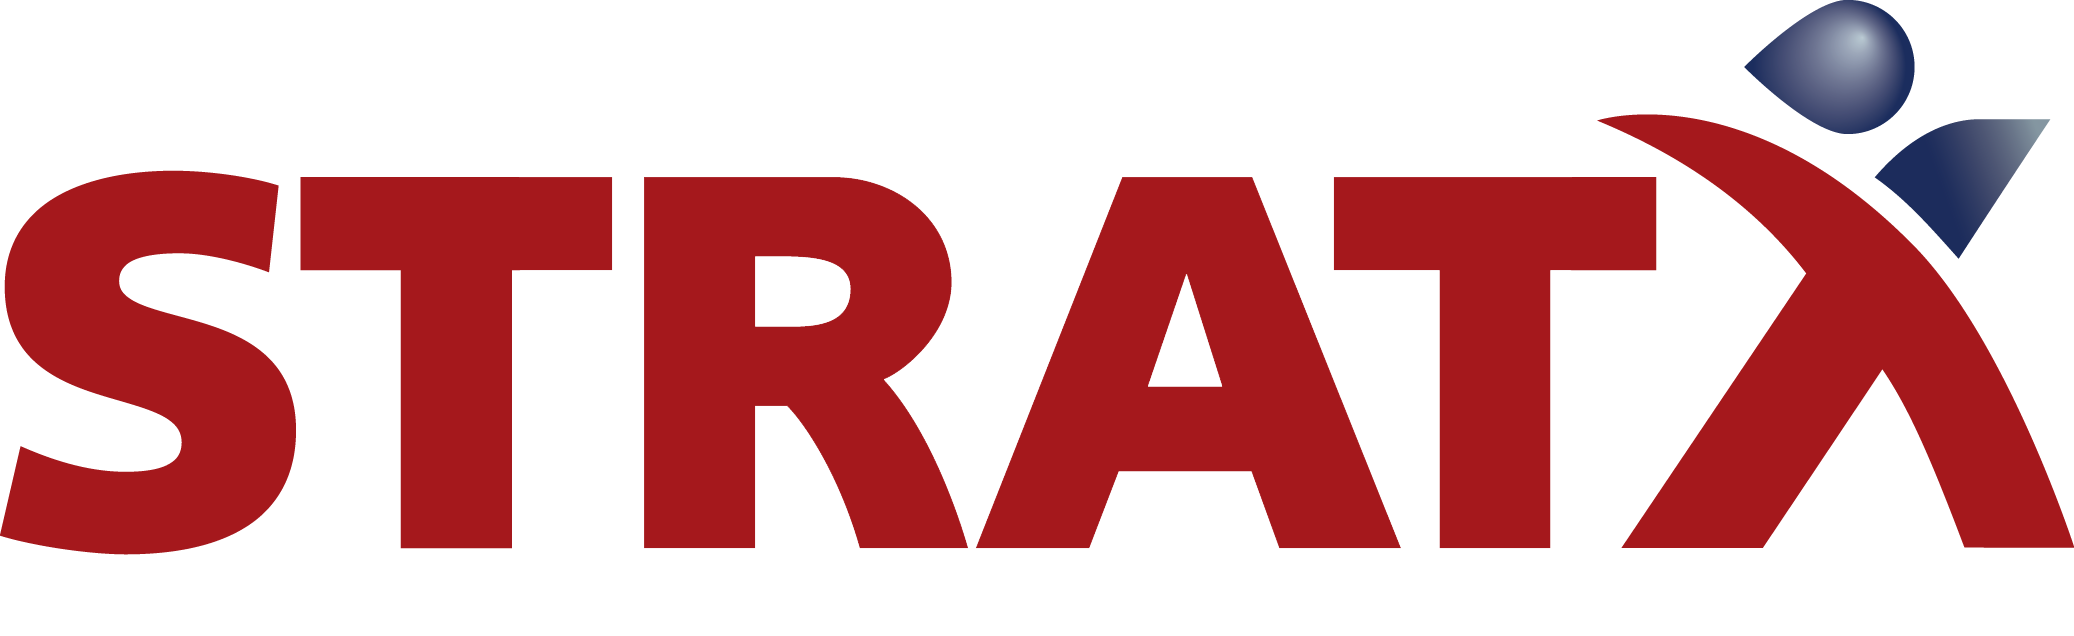 StratX_Logo_4C_Transparent.png